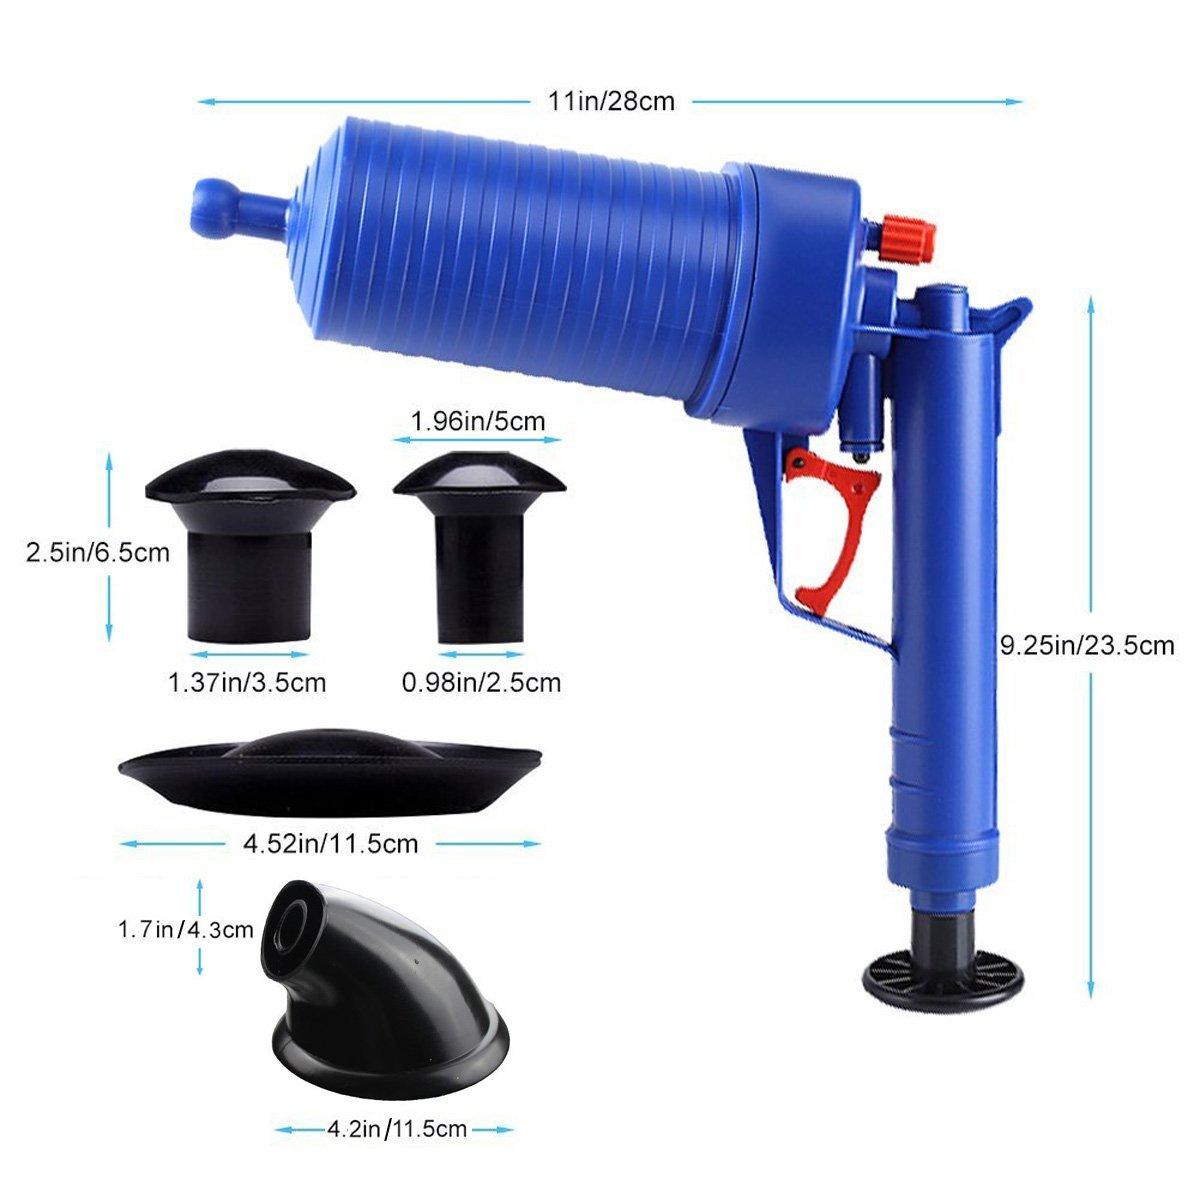 air power high pressure drain blaster gun and powerful manual sink plunger opener cleaner pump